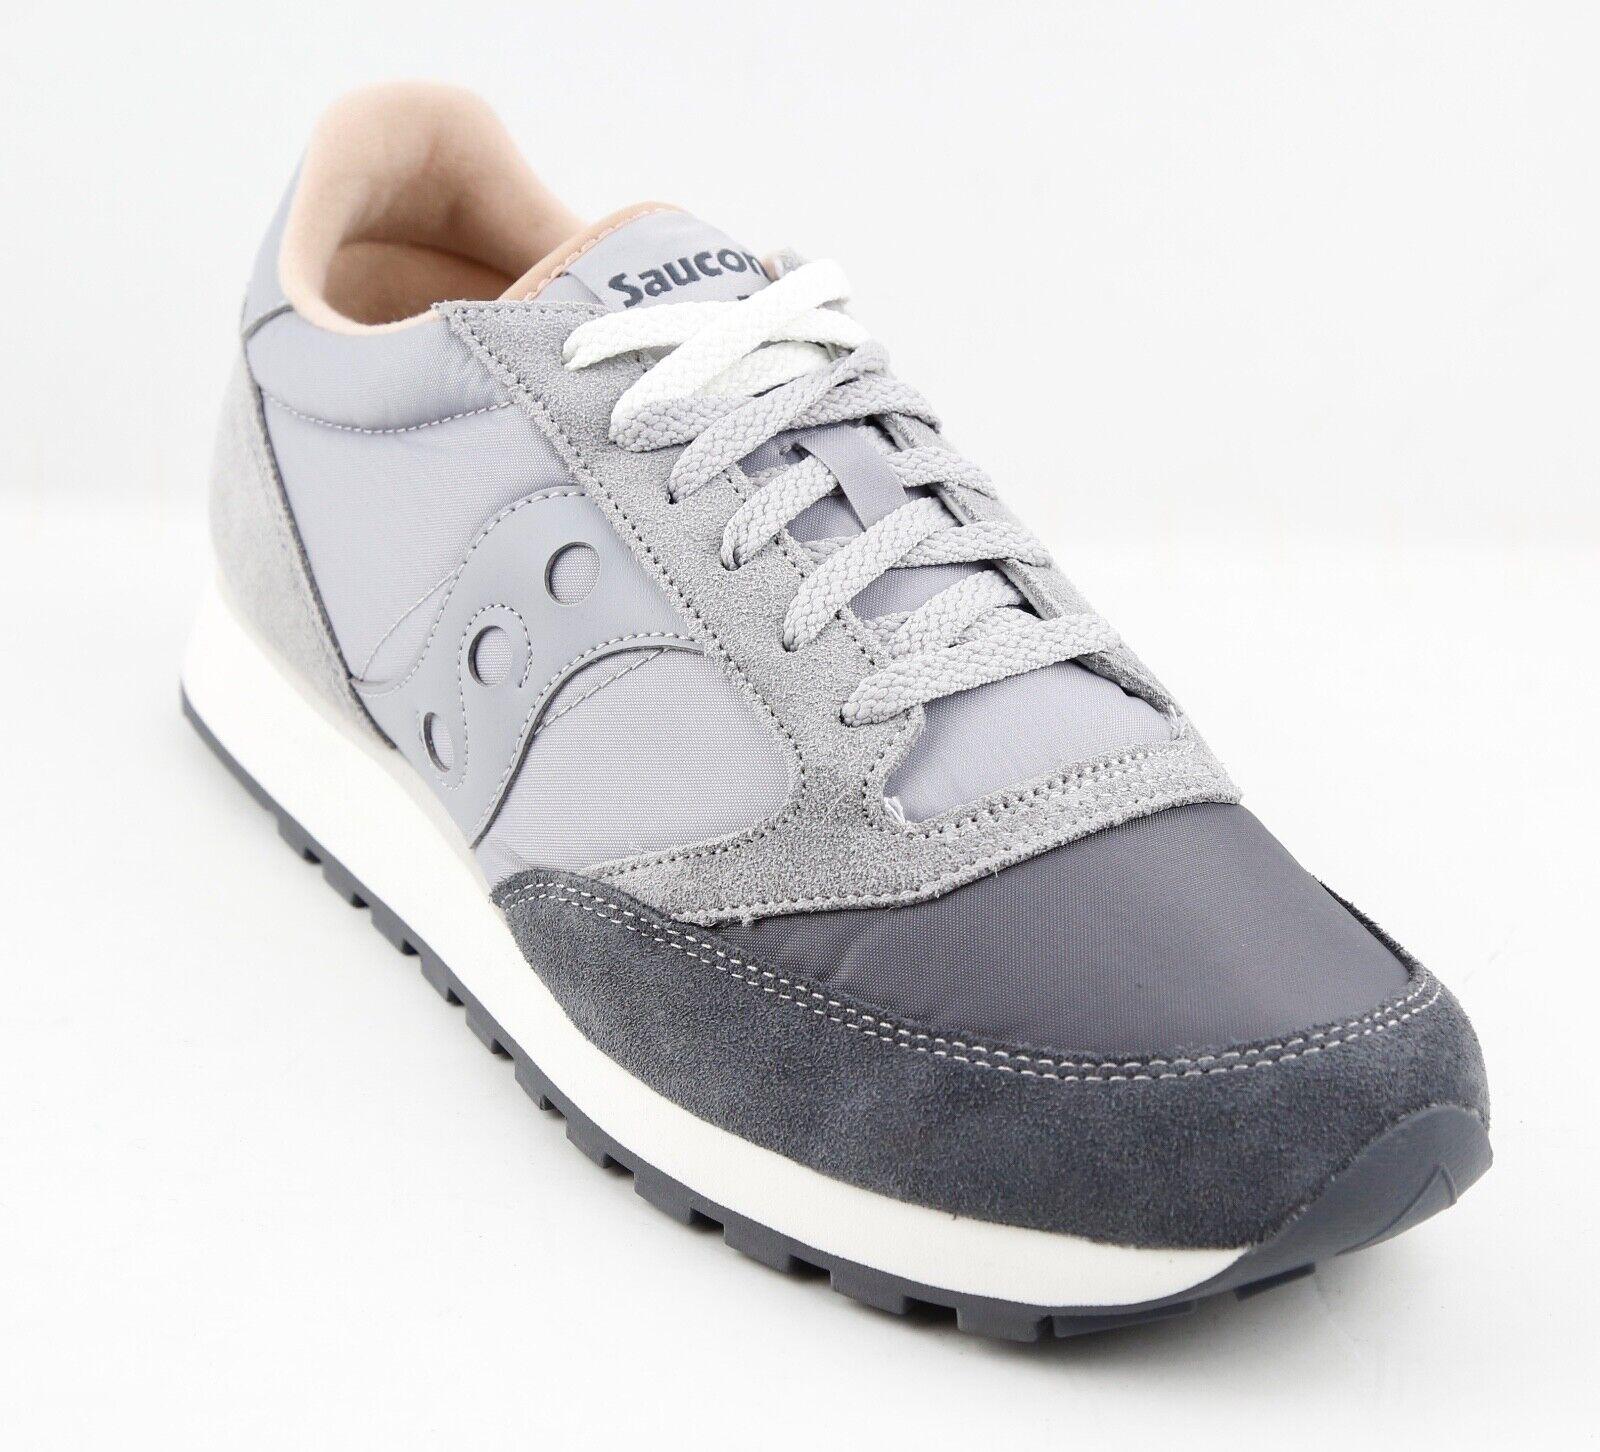 Perla Così tanti Facilitare  Saucony Originals Mens Jazz Low Pro Sneaker Blue/grey 8 M US for sale  online | eBay